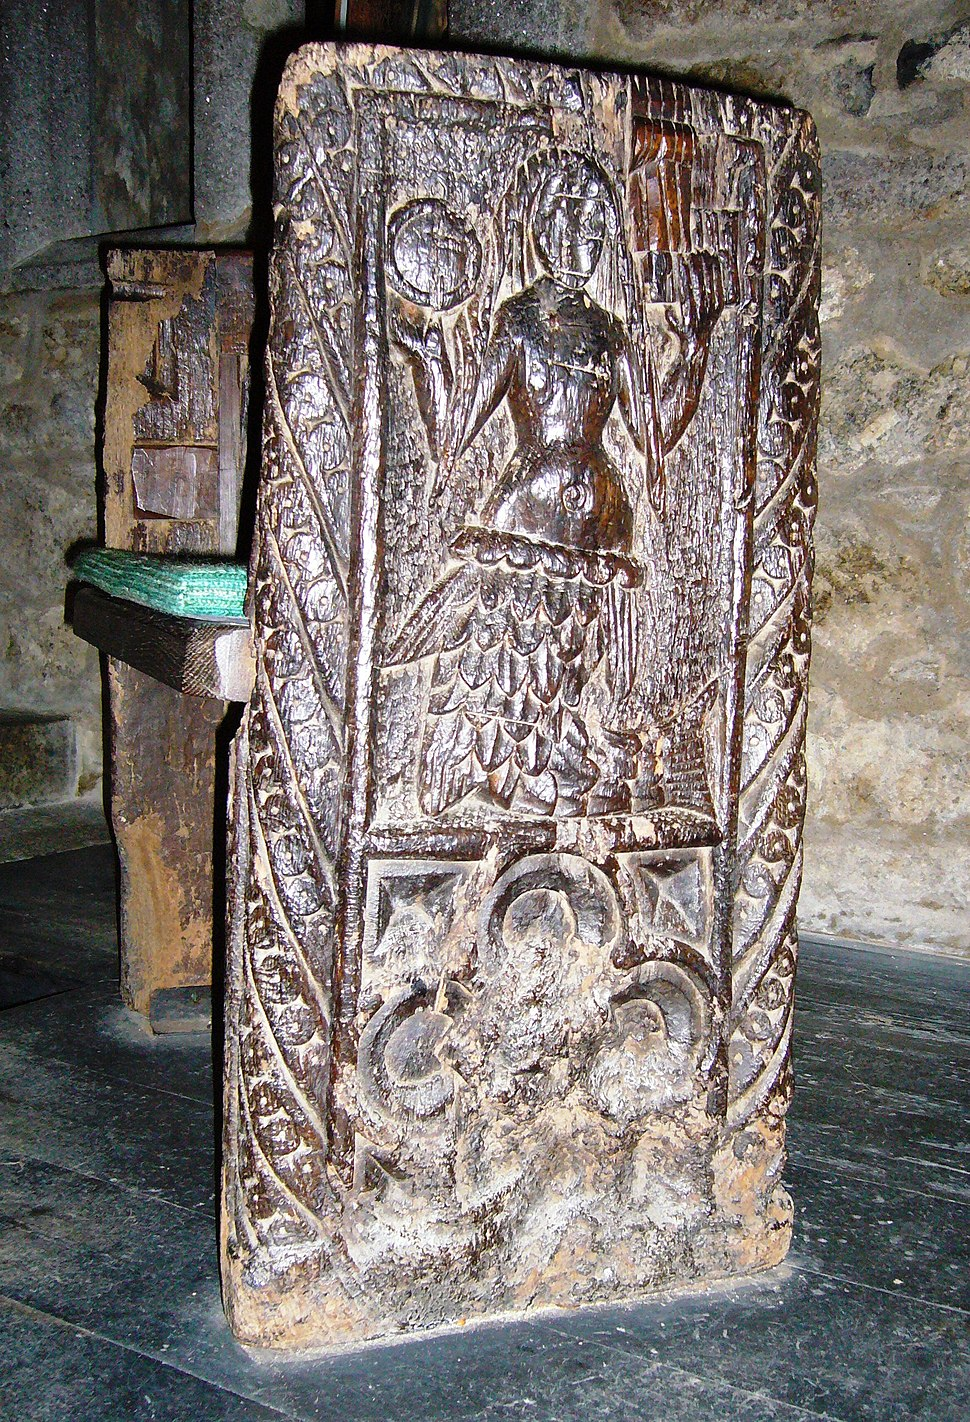 Zennor Mermaid Chair